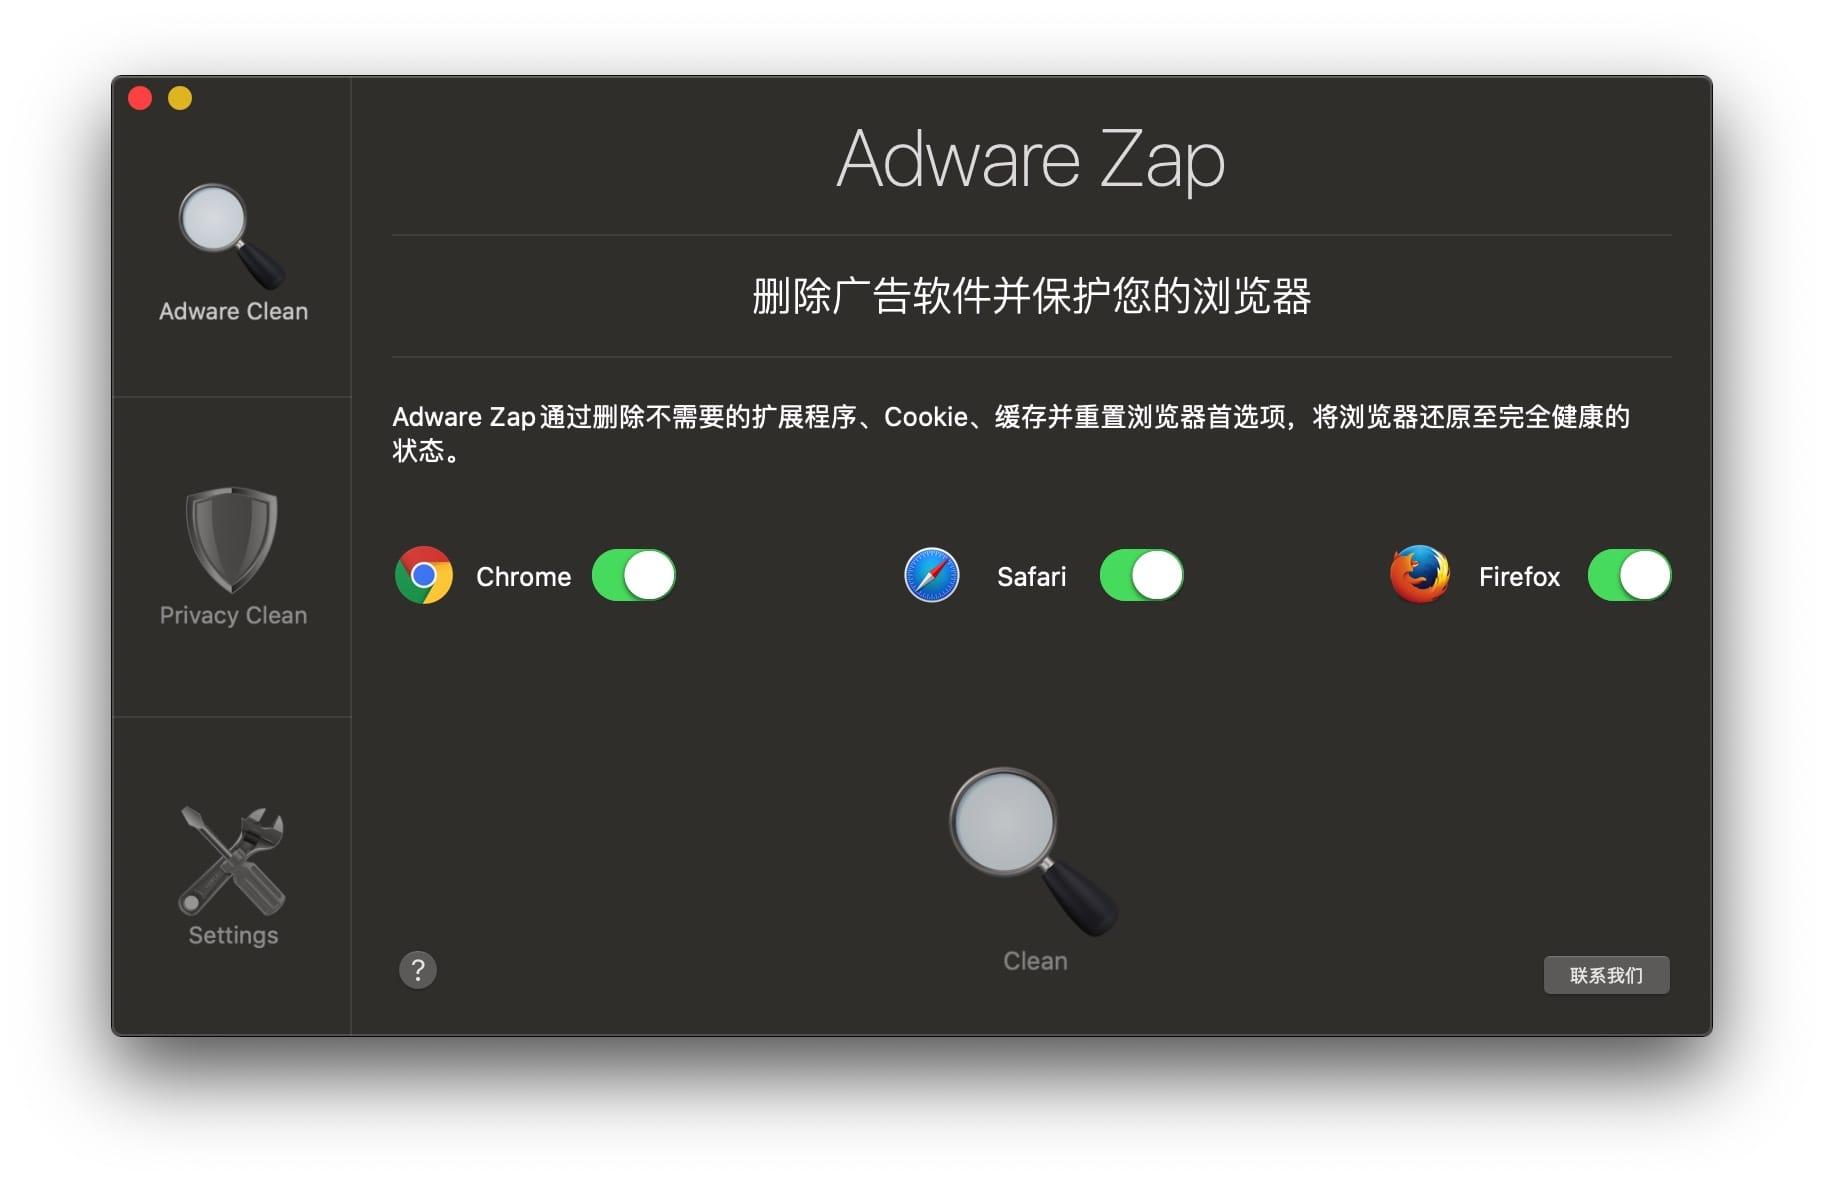 Adware Zap Pro 2.7.5.0 恶意软件和间谍软件扫描和删除-马克喵